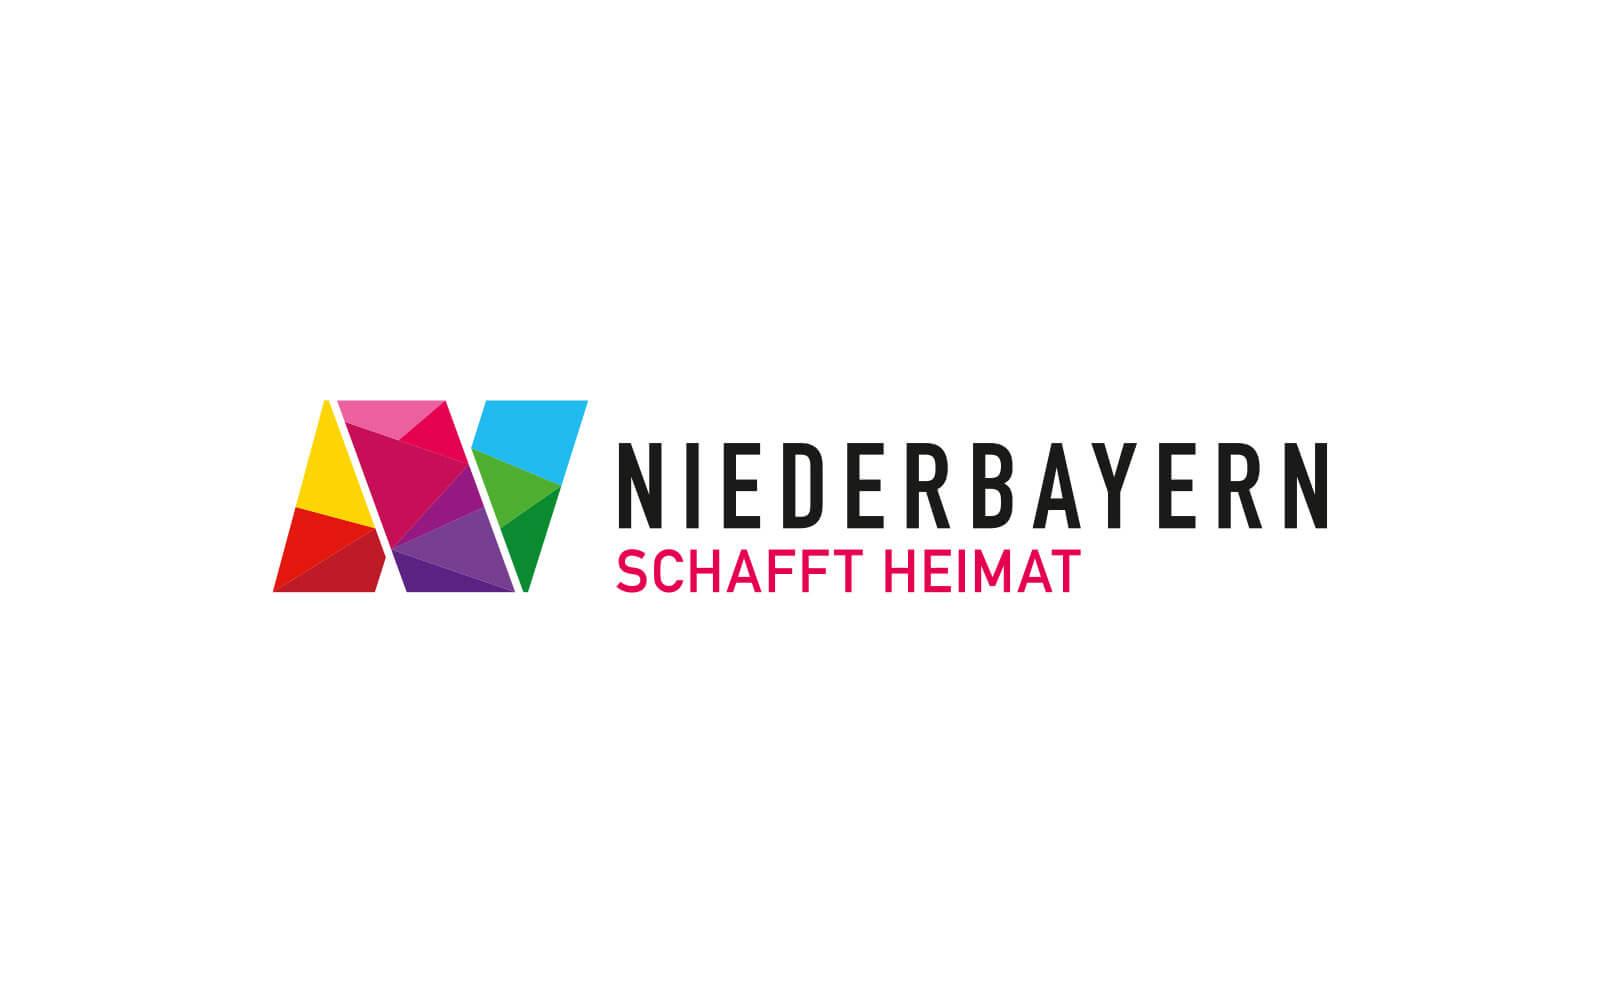 Niederbayern Logo – Dachmarke »Schafft Heimat« quer